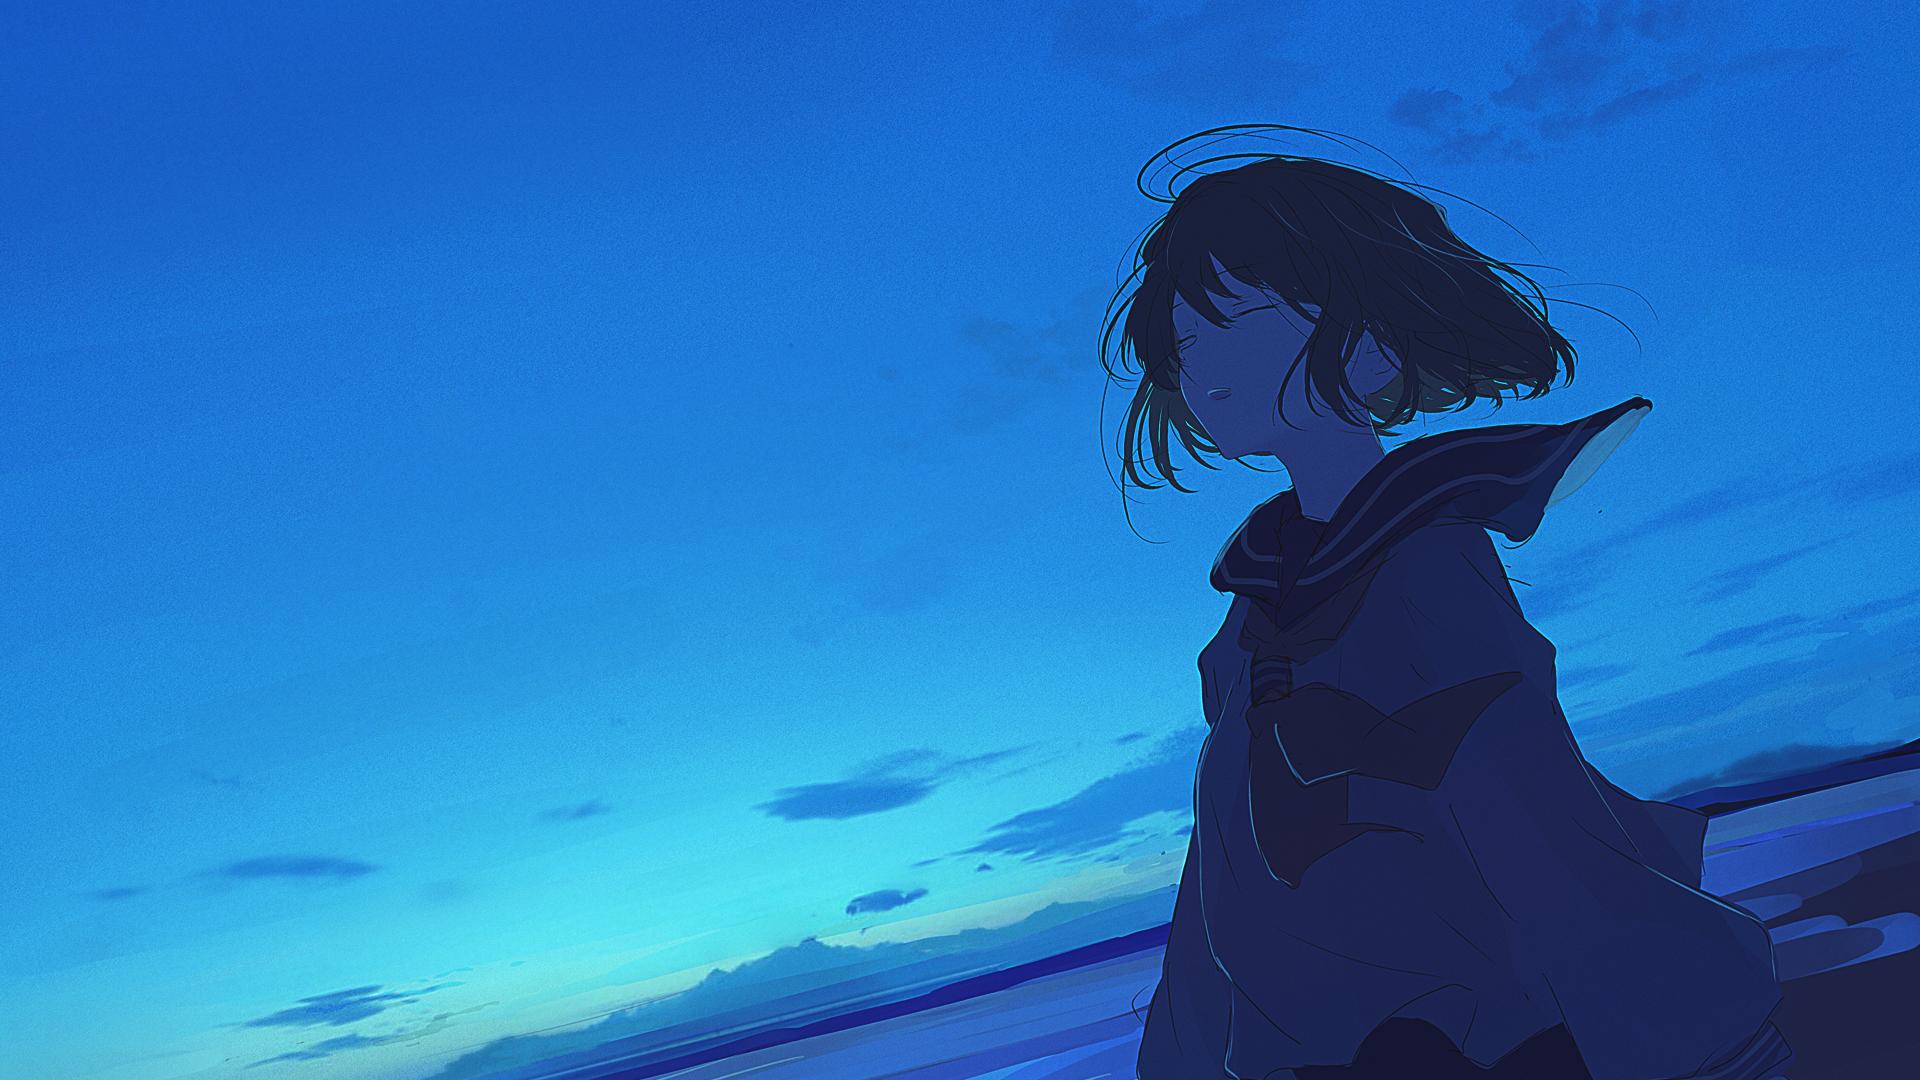 Anime 1920x1080 anime girls anime sky moescape